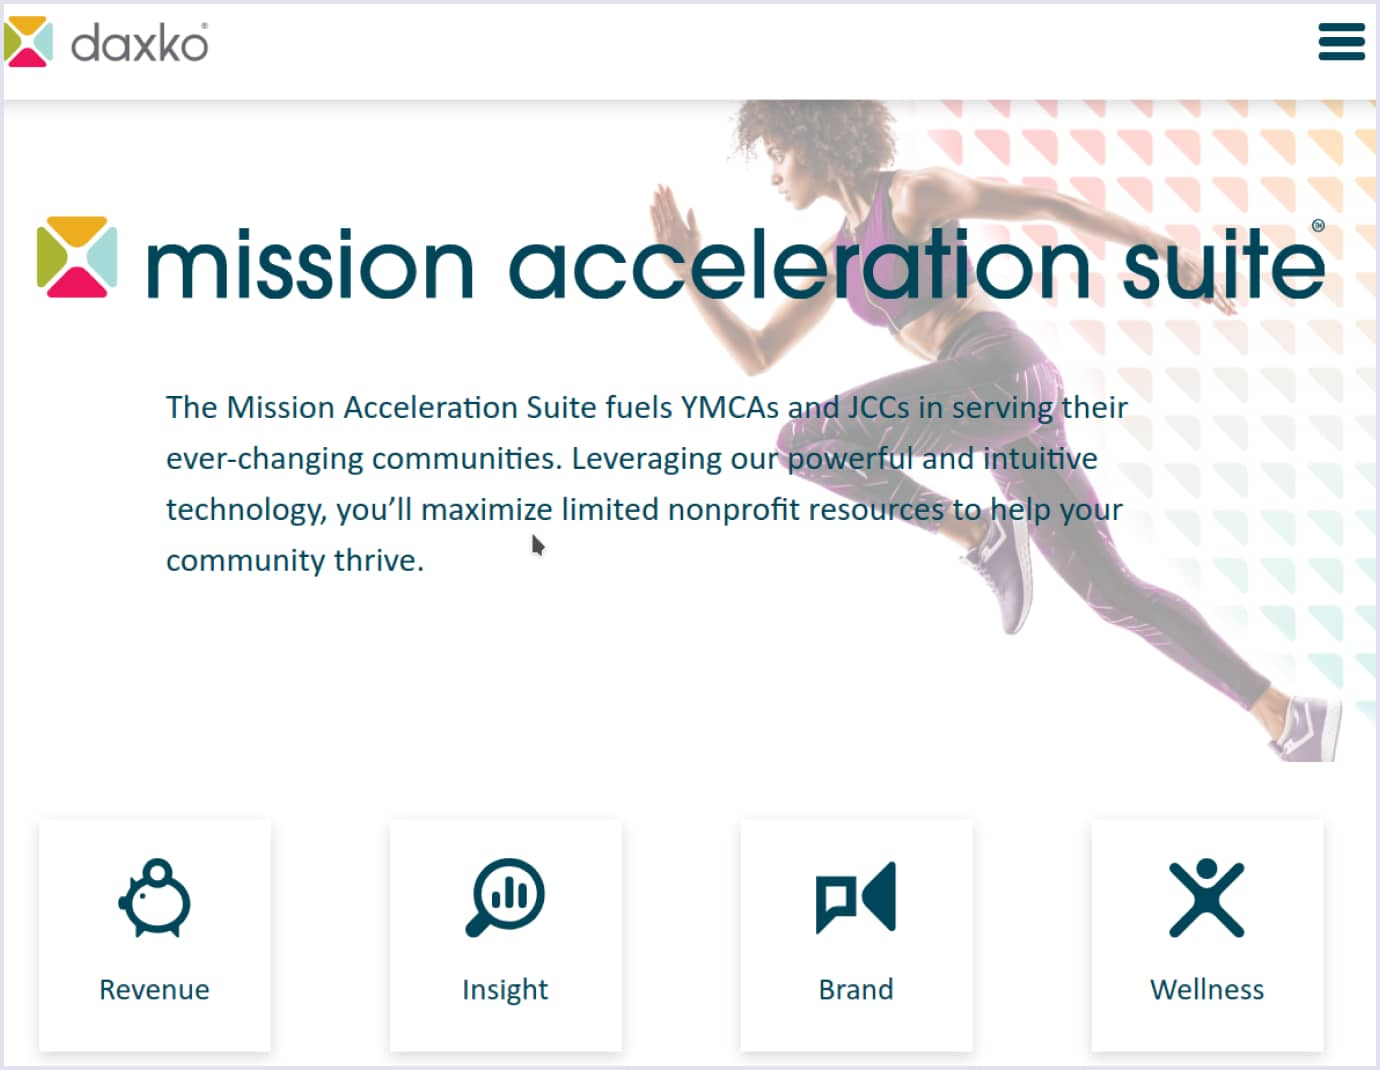 SaaS-based financial management solution